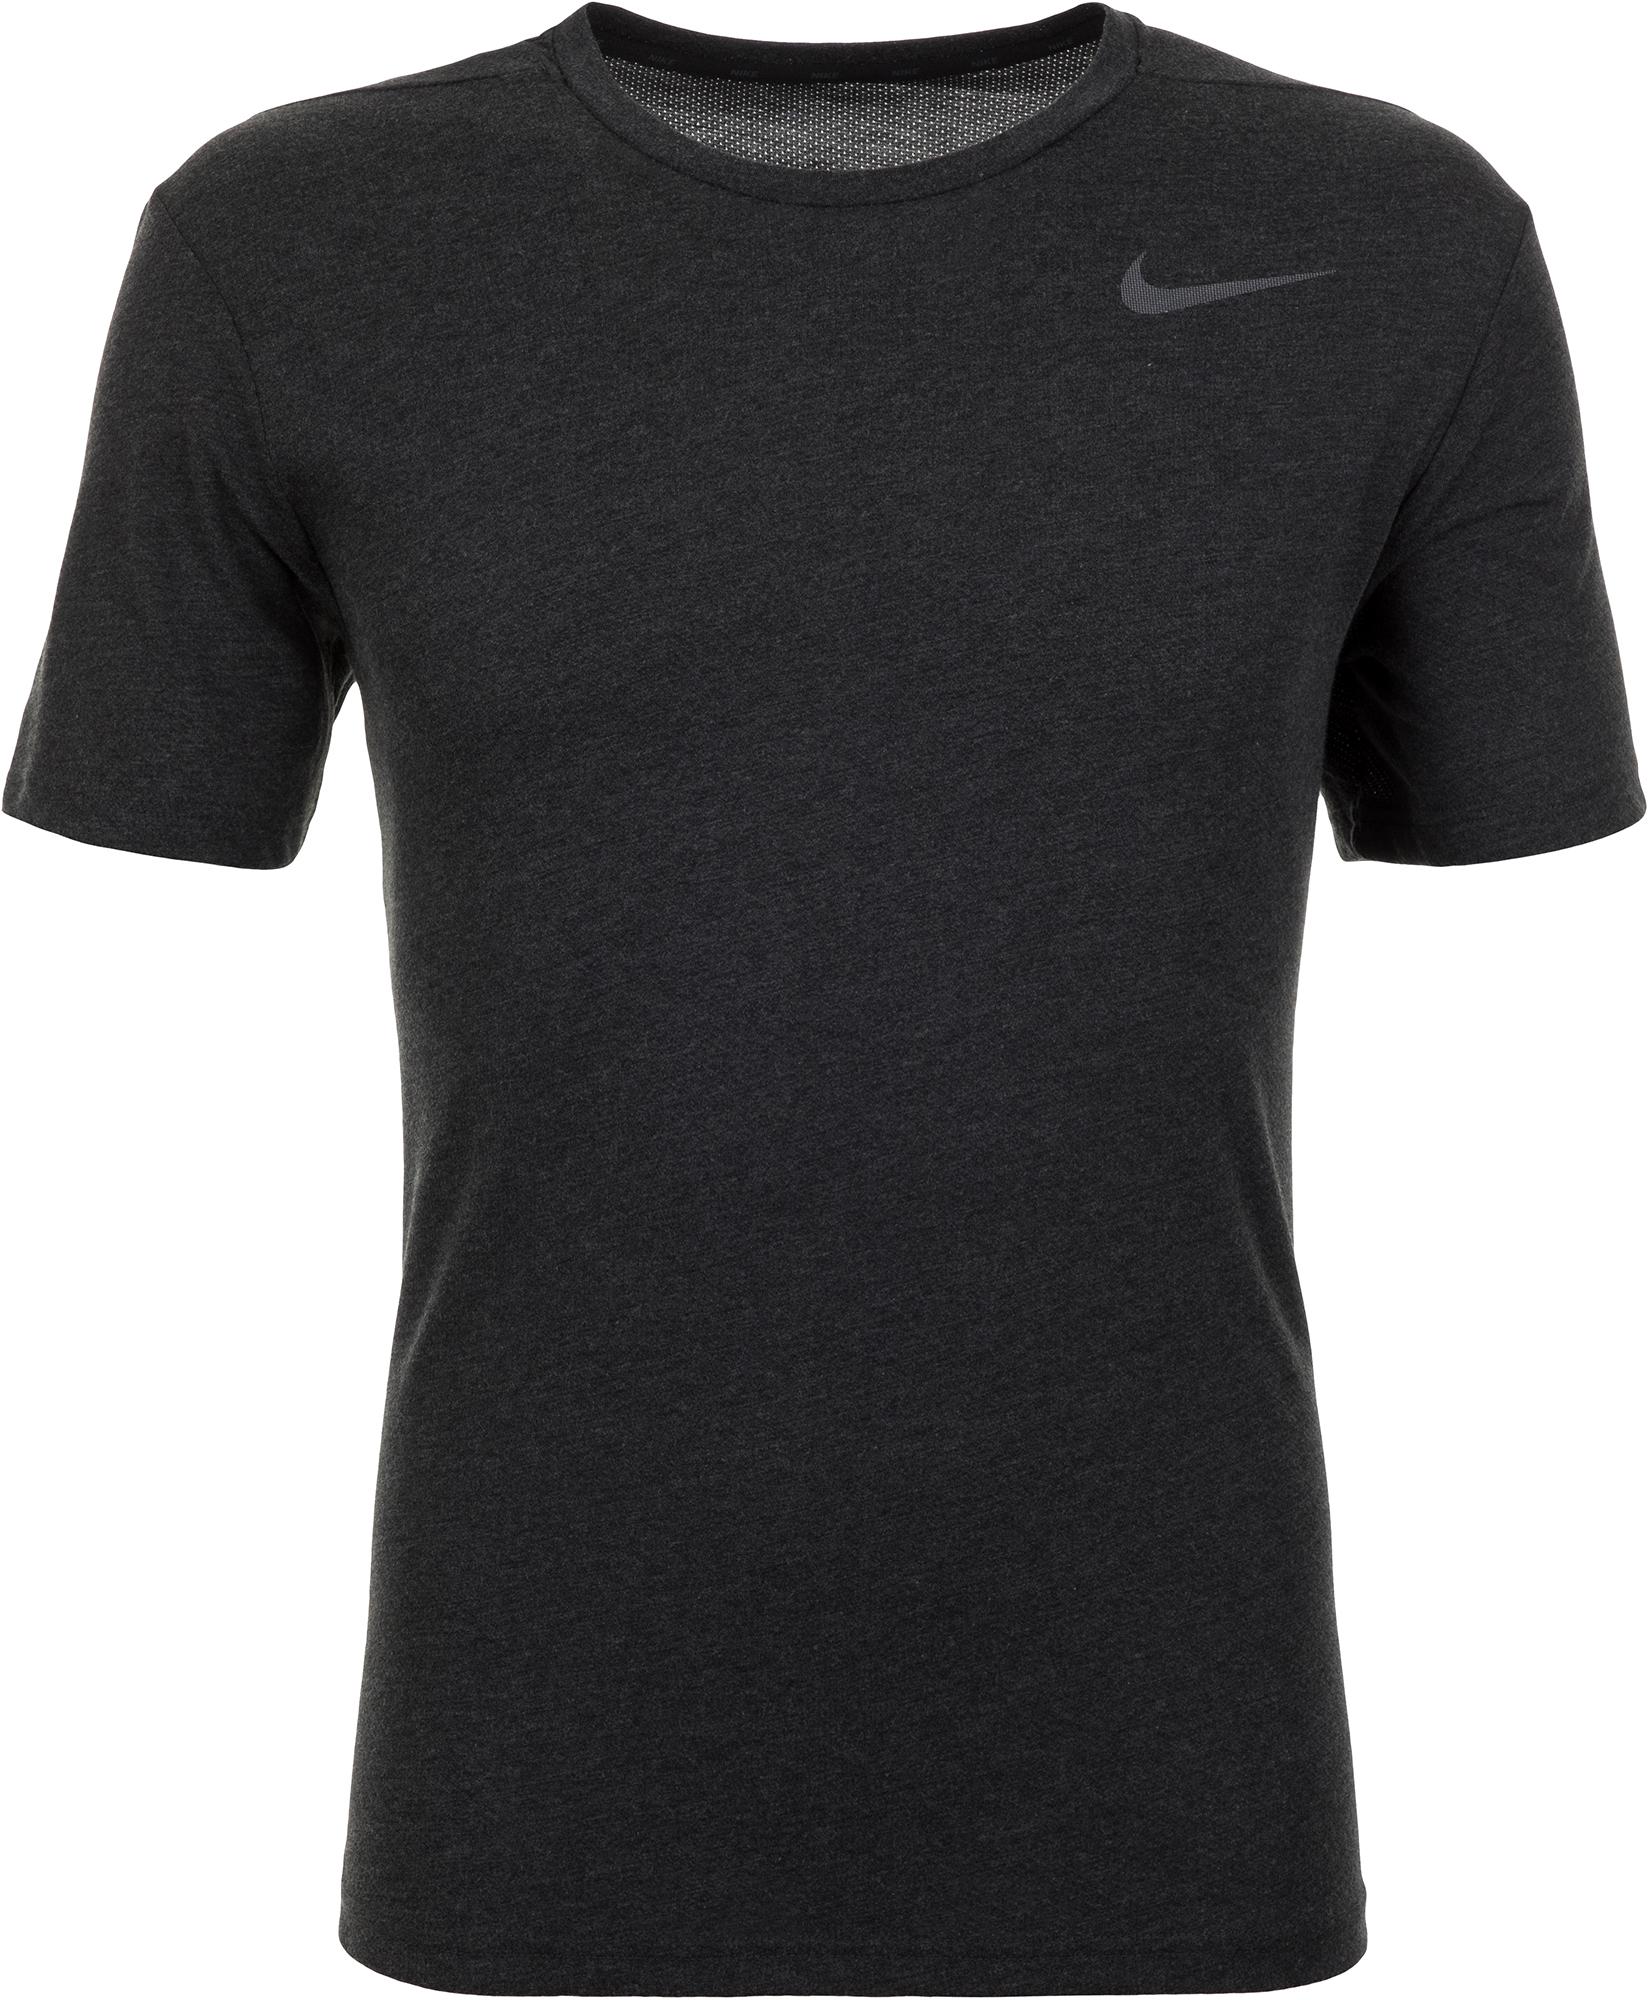 Фото Nike Футболка мужская Nike Breathe, размер 46-48